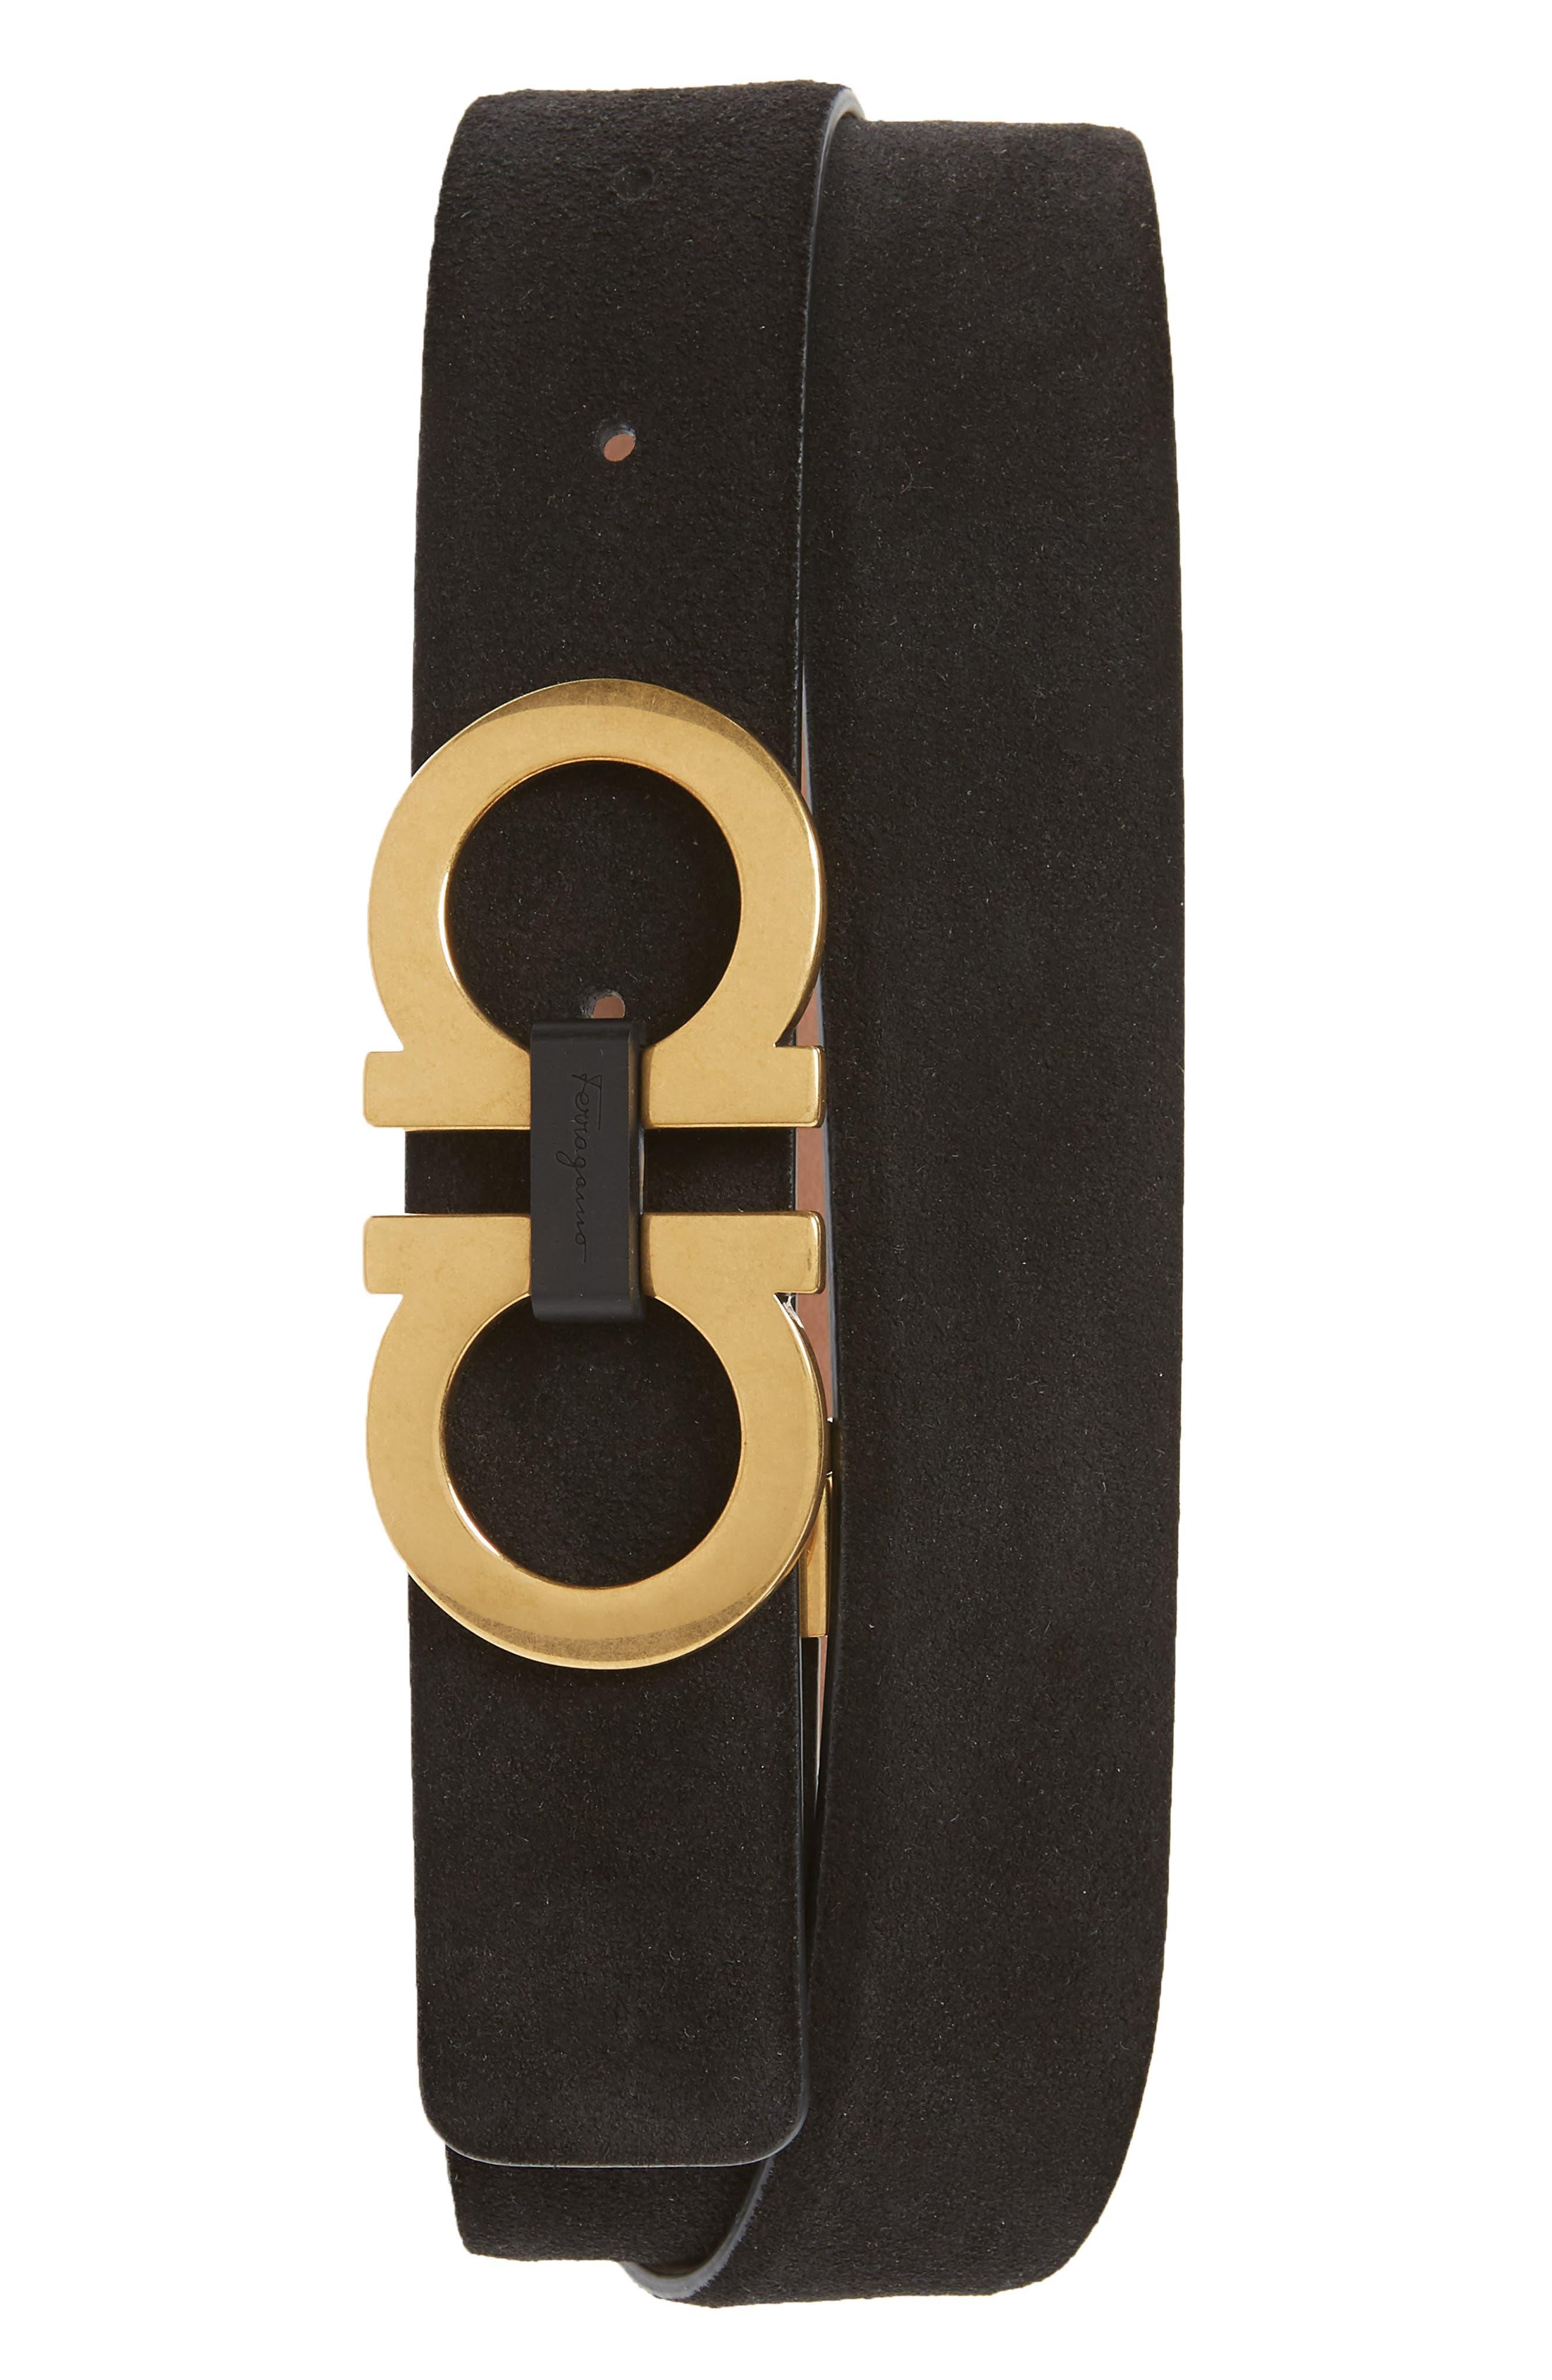 SALVATORE FERRAGAMO, Suede Leather Belt, Main thumbnail 1, color, NERO